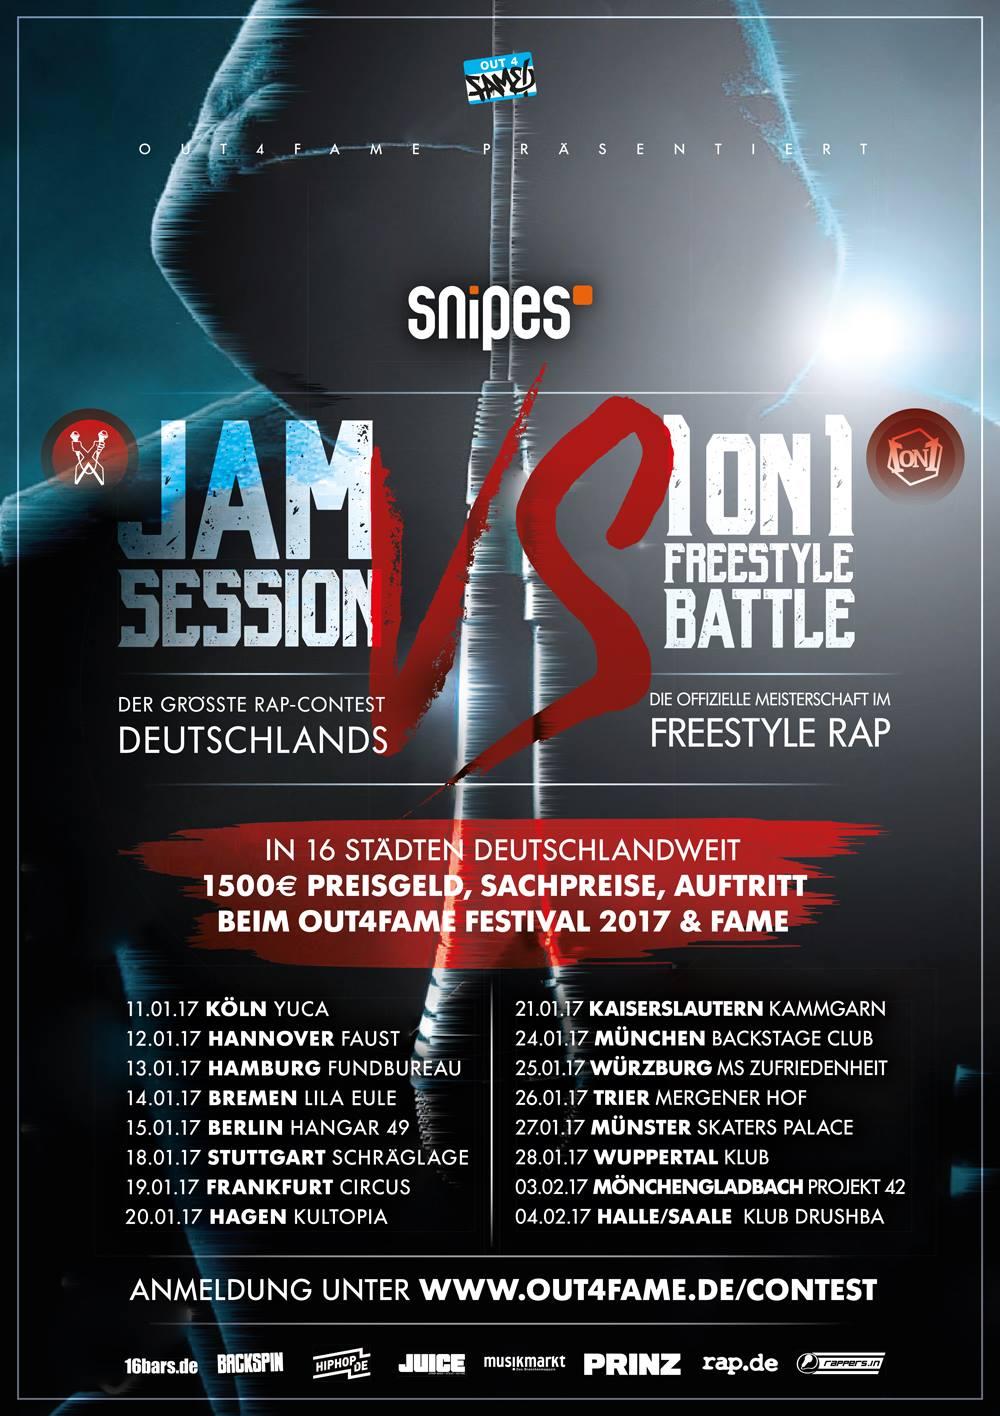 Jamsession in Halle